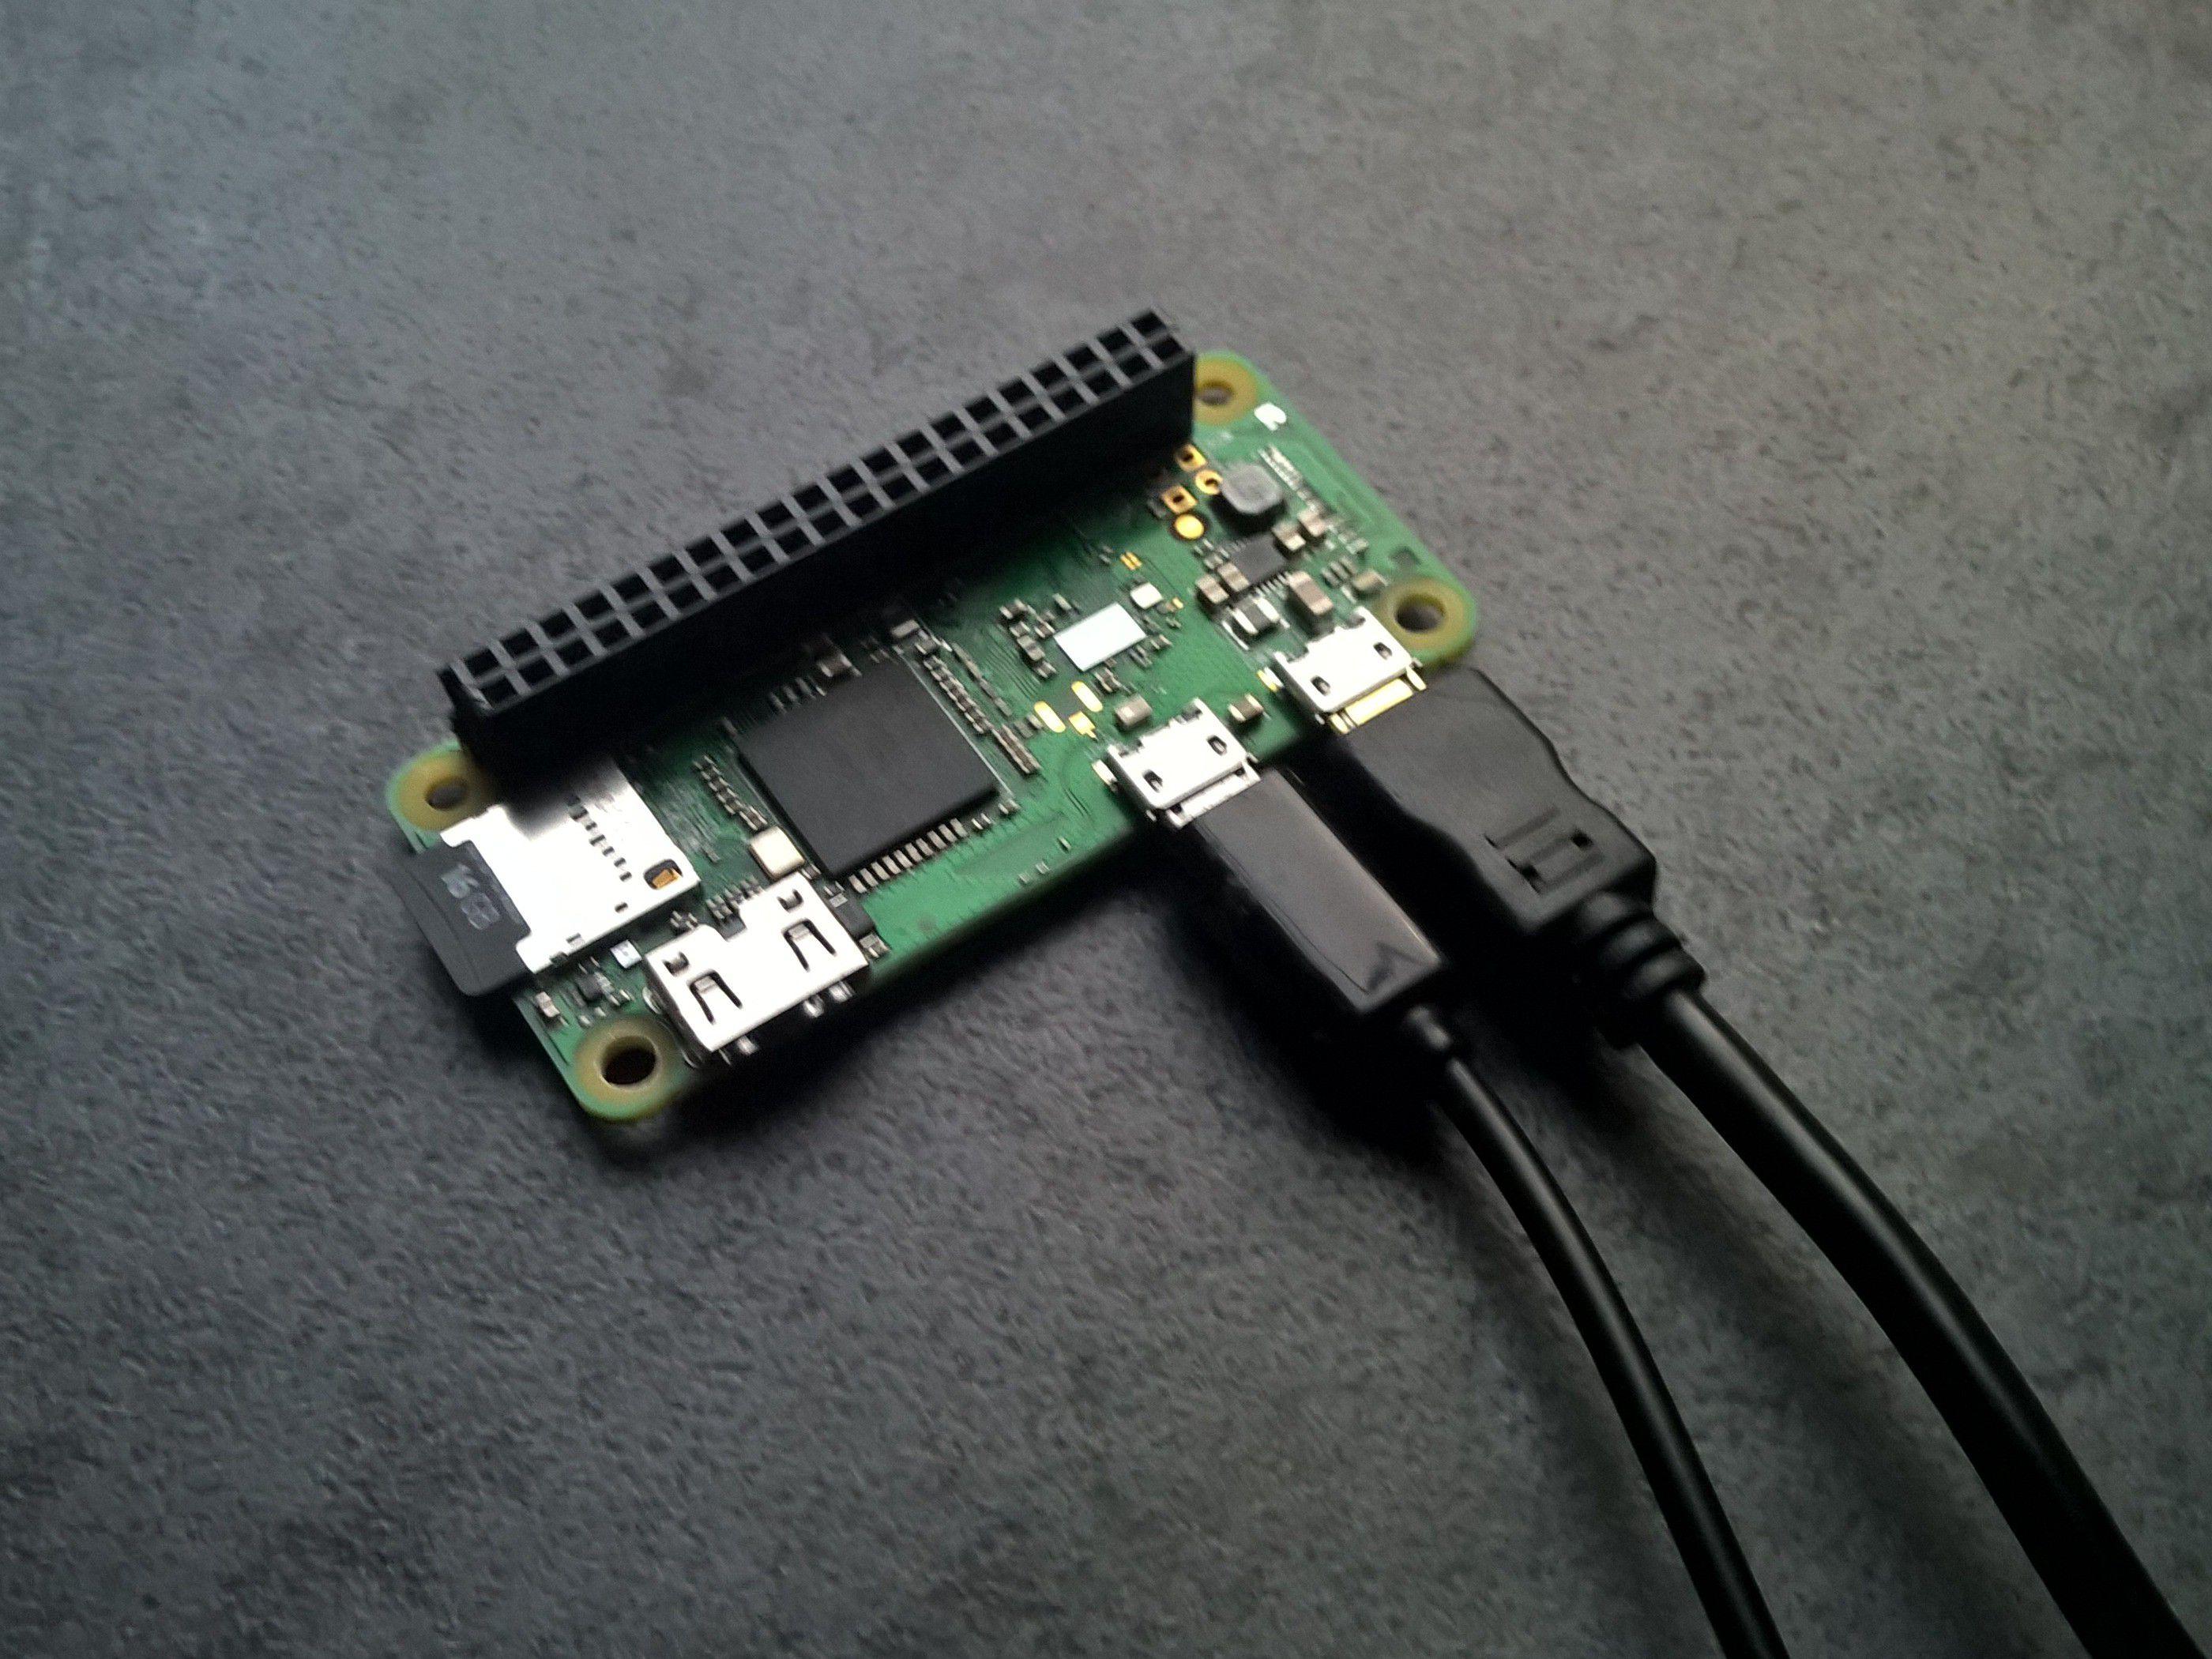 Raspberry Pi Zero W als smarter USB-Stick - PC-WELT